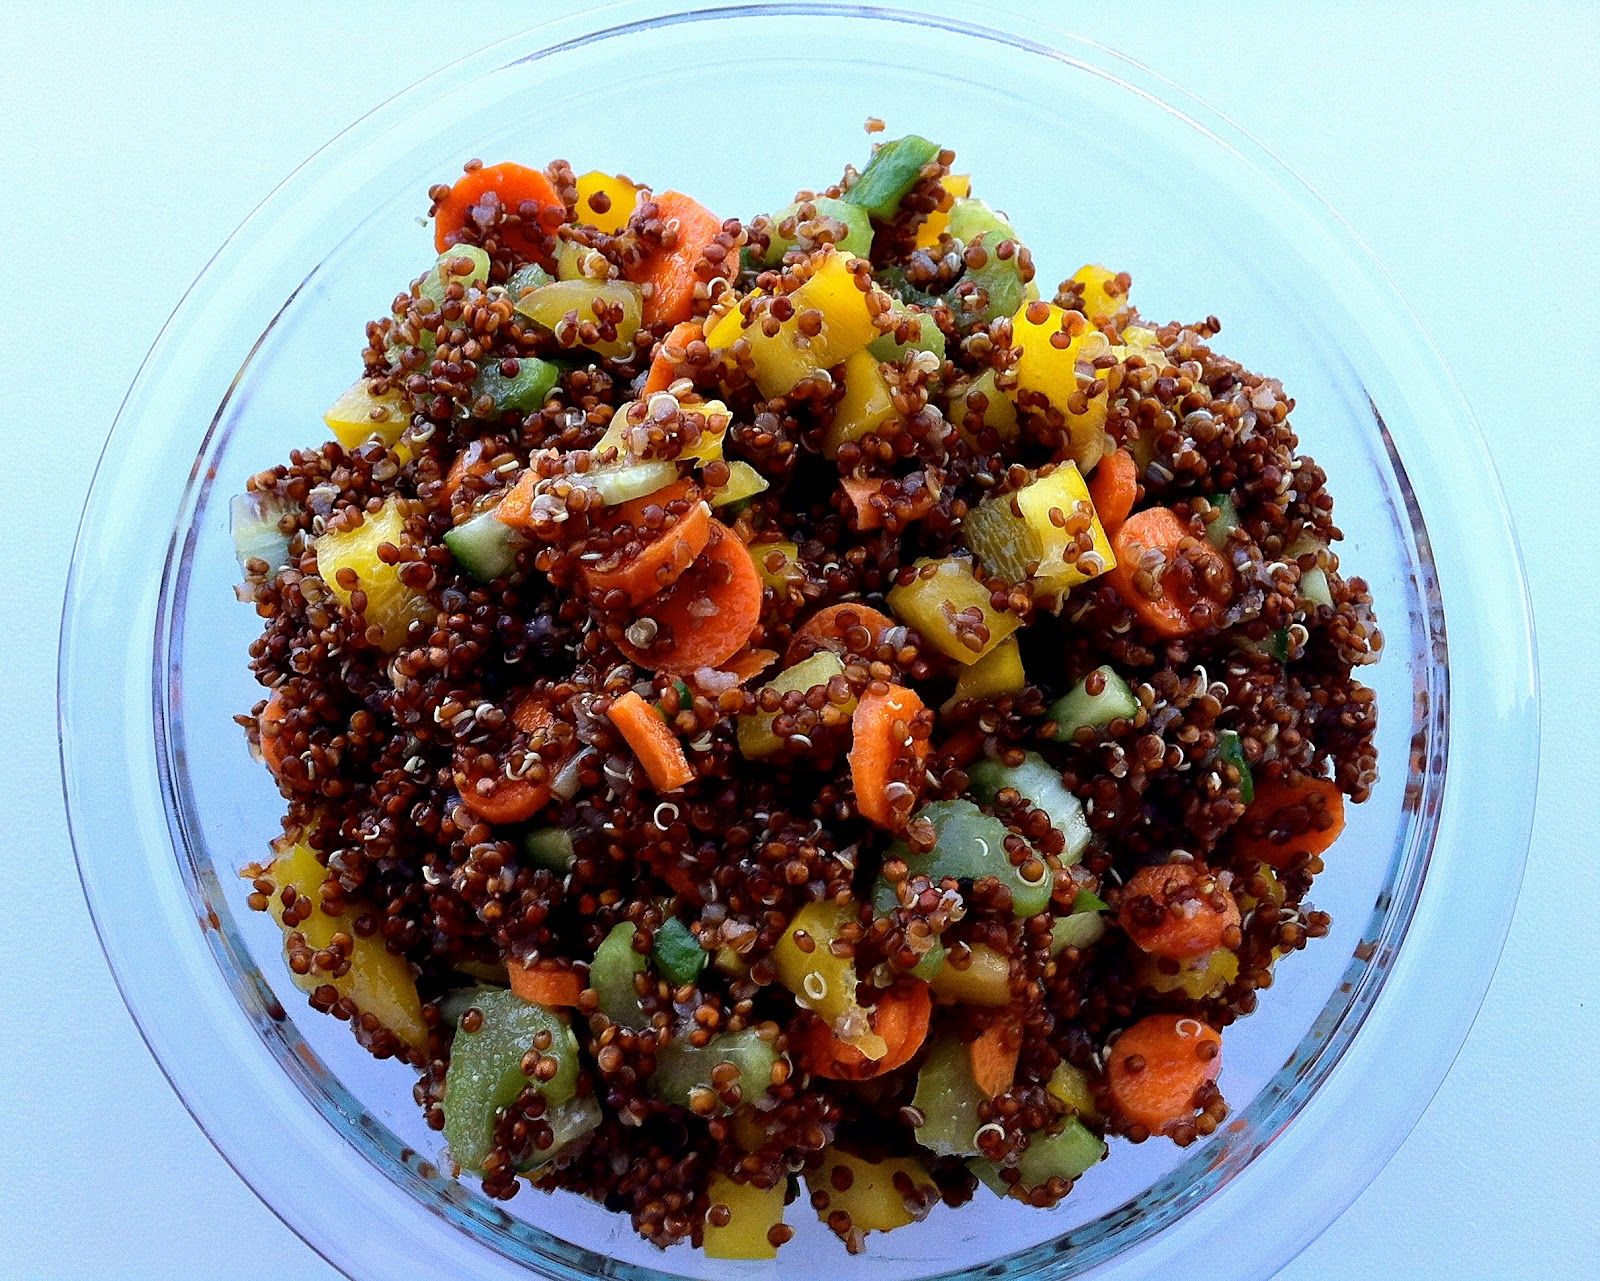 Delaine's Skinny Delights: Quinoa Summer Salad